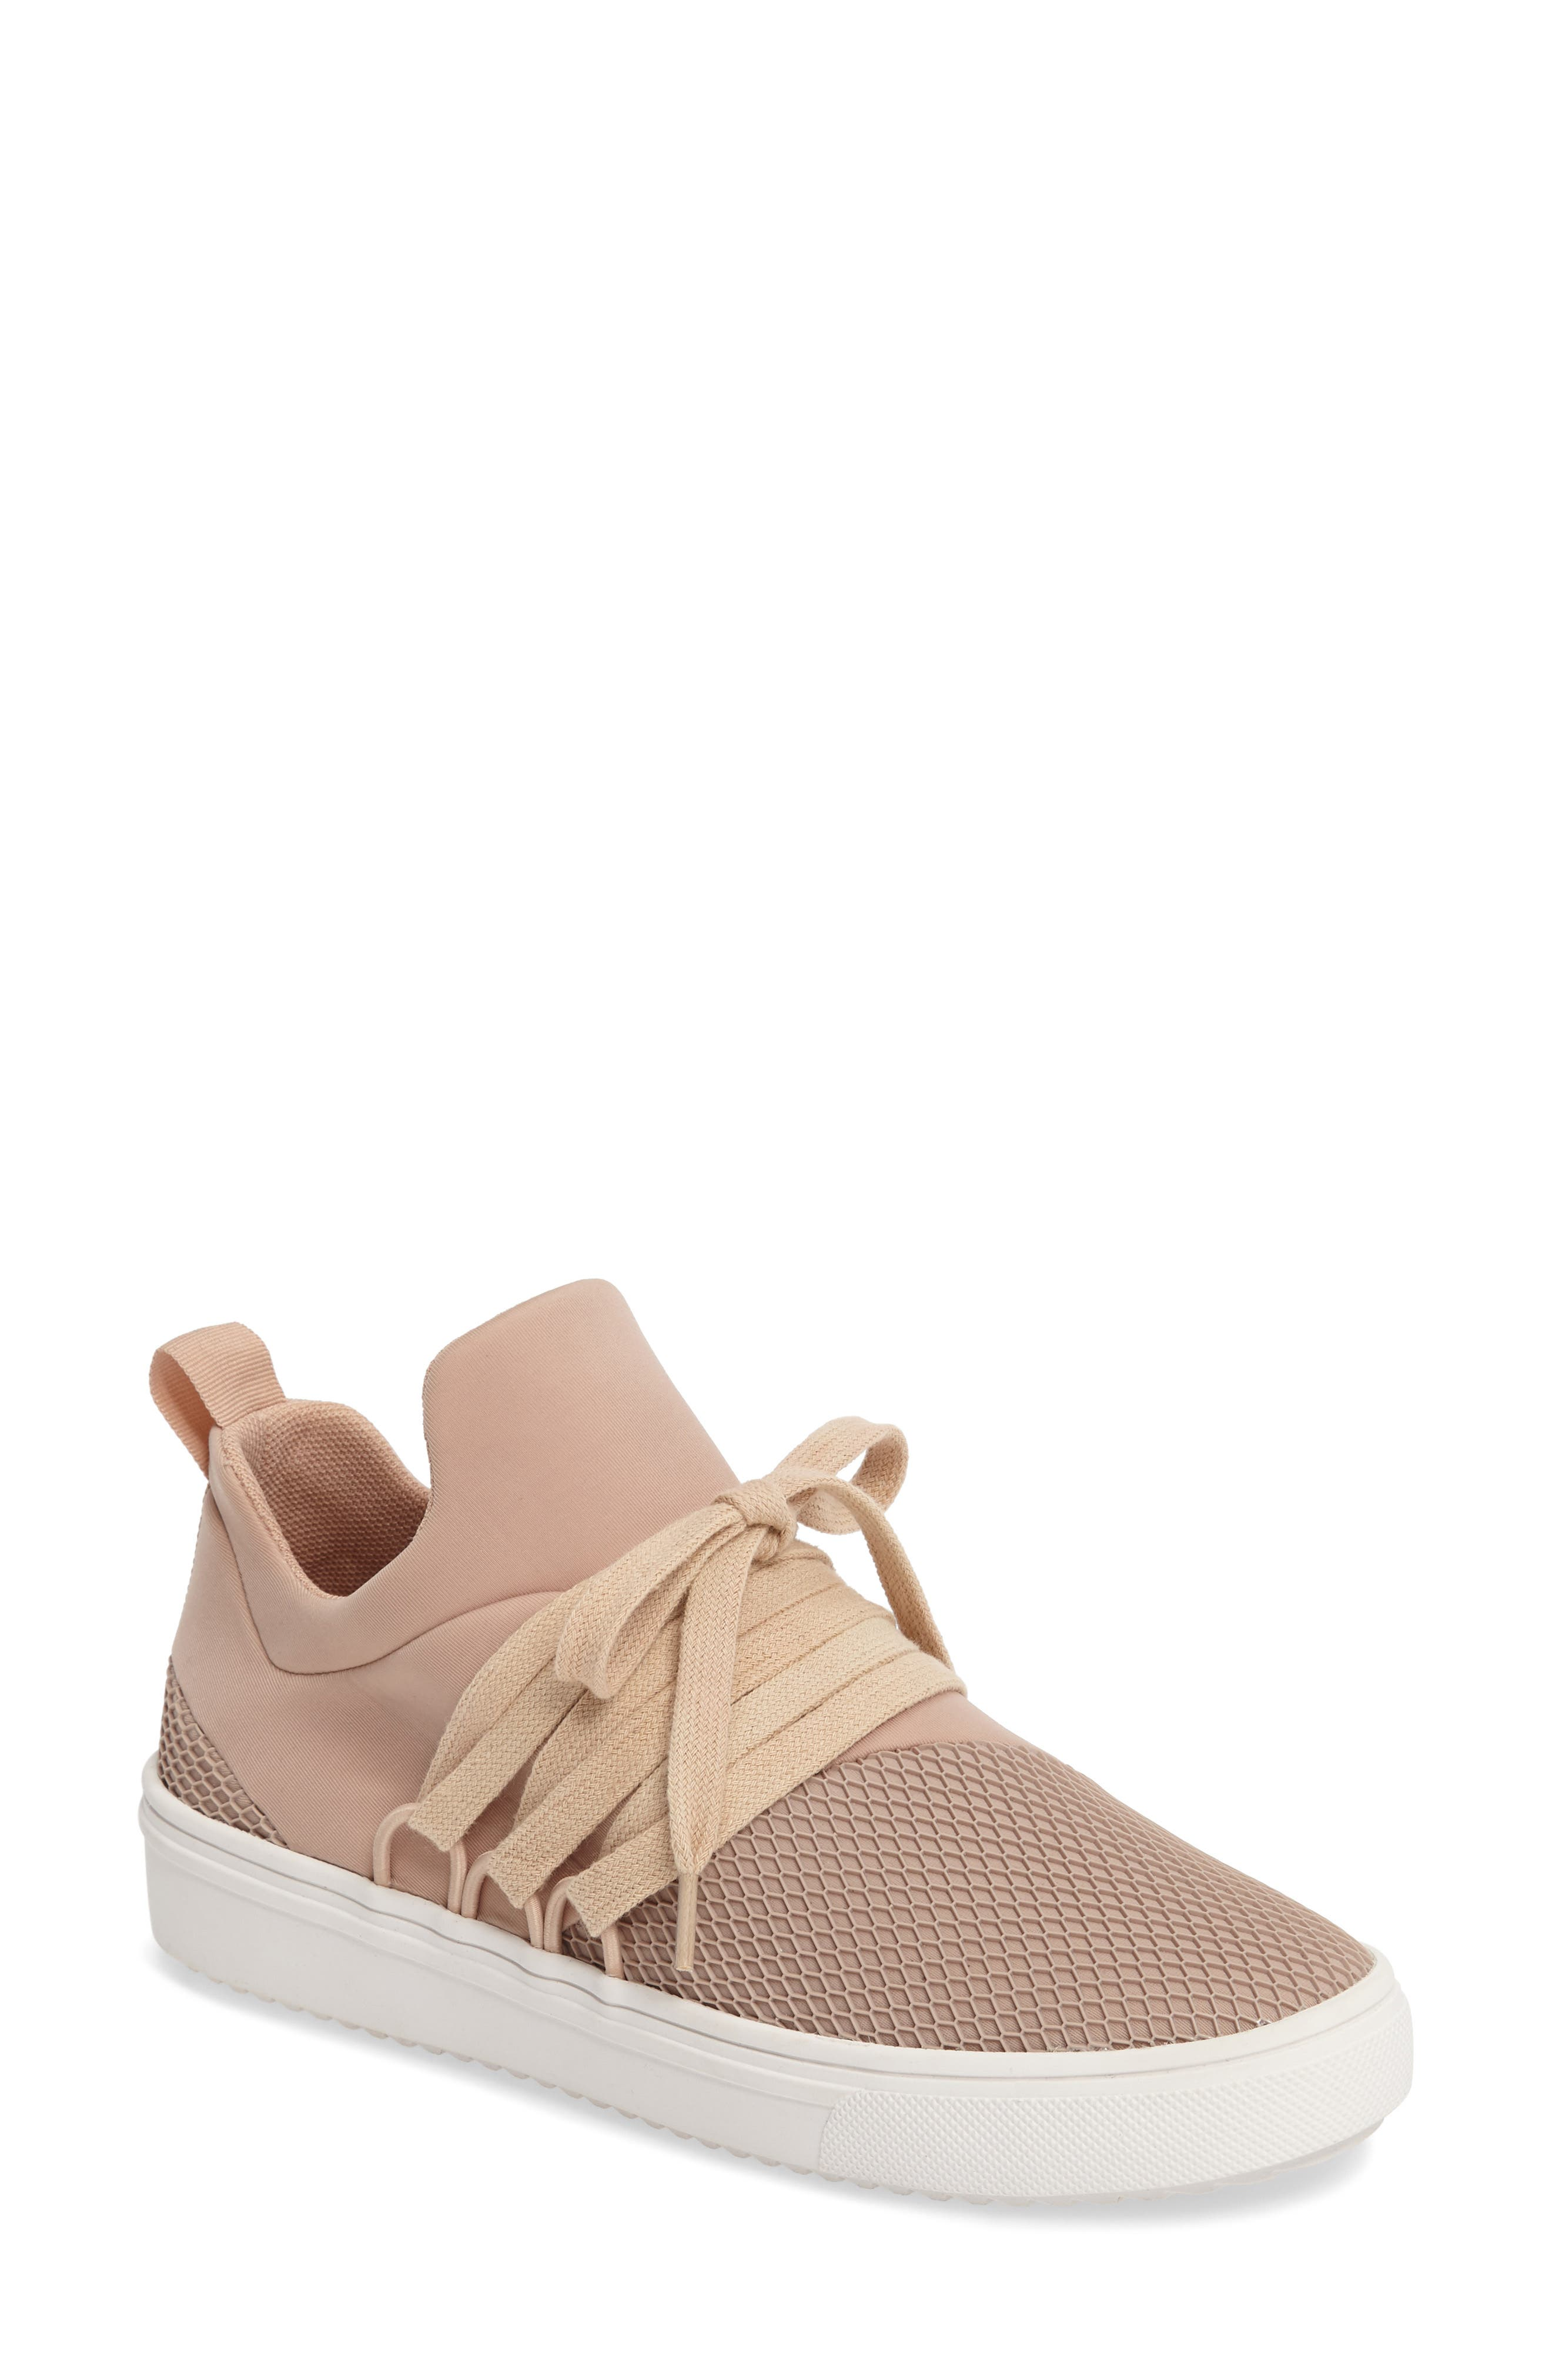 44366aaec5139 ... UPC 190640975551 product image for Women's Steve Madden Lancer Sneaker,  Size 10 M - Pink